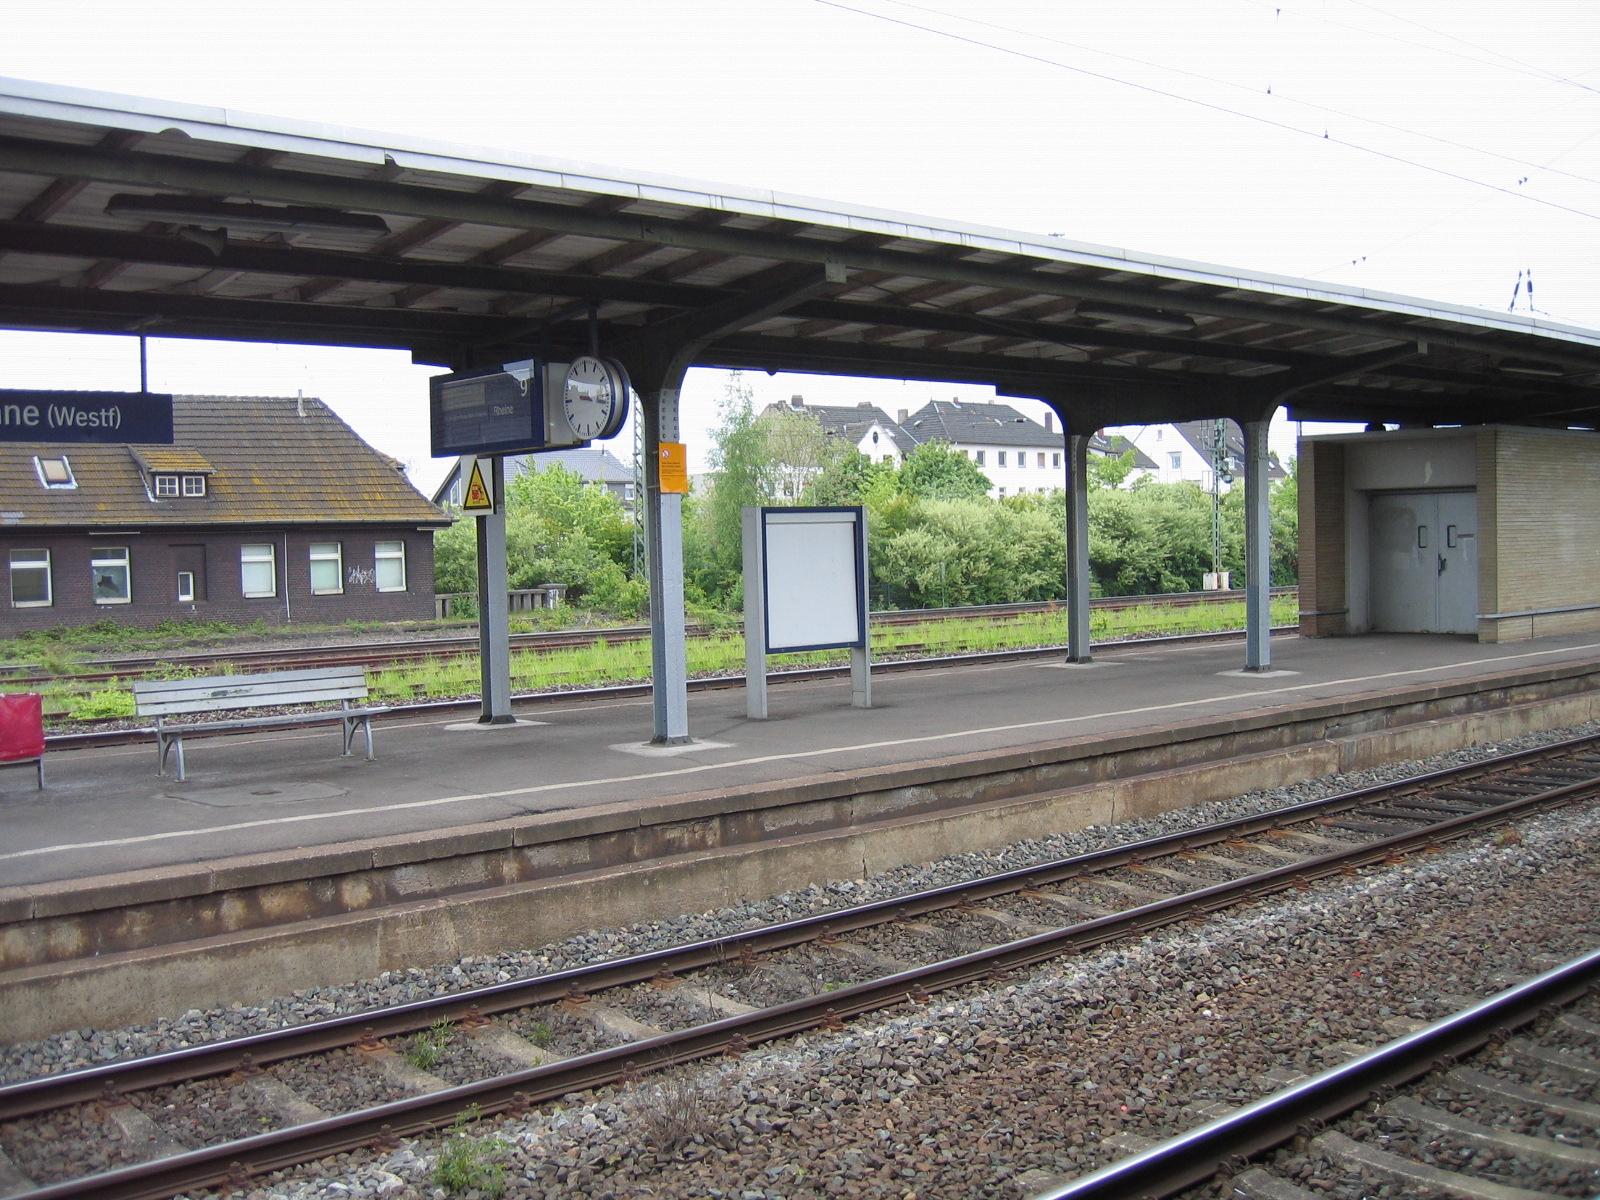 Bahnhof L Hne file 2010 05 11 löhne hbf 8 jpg wikimedia commons